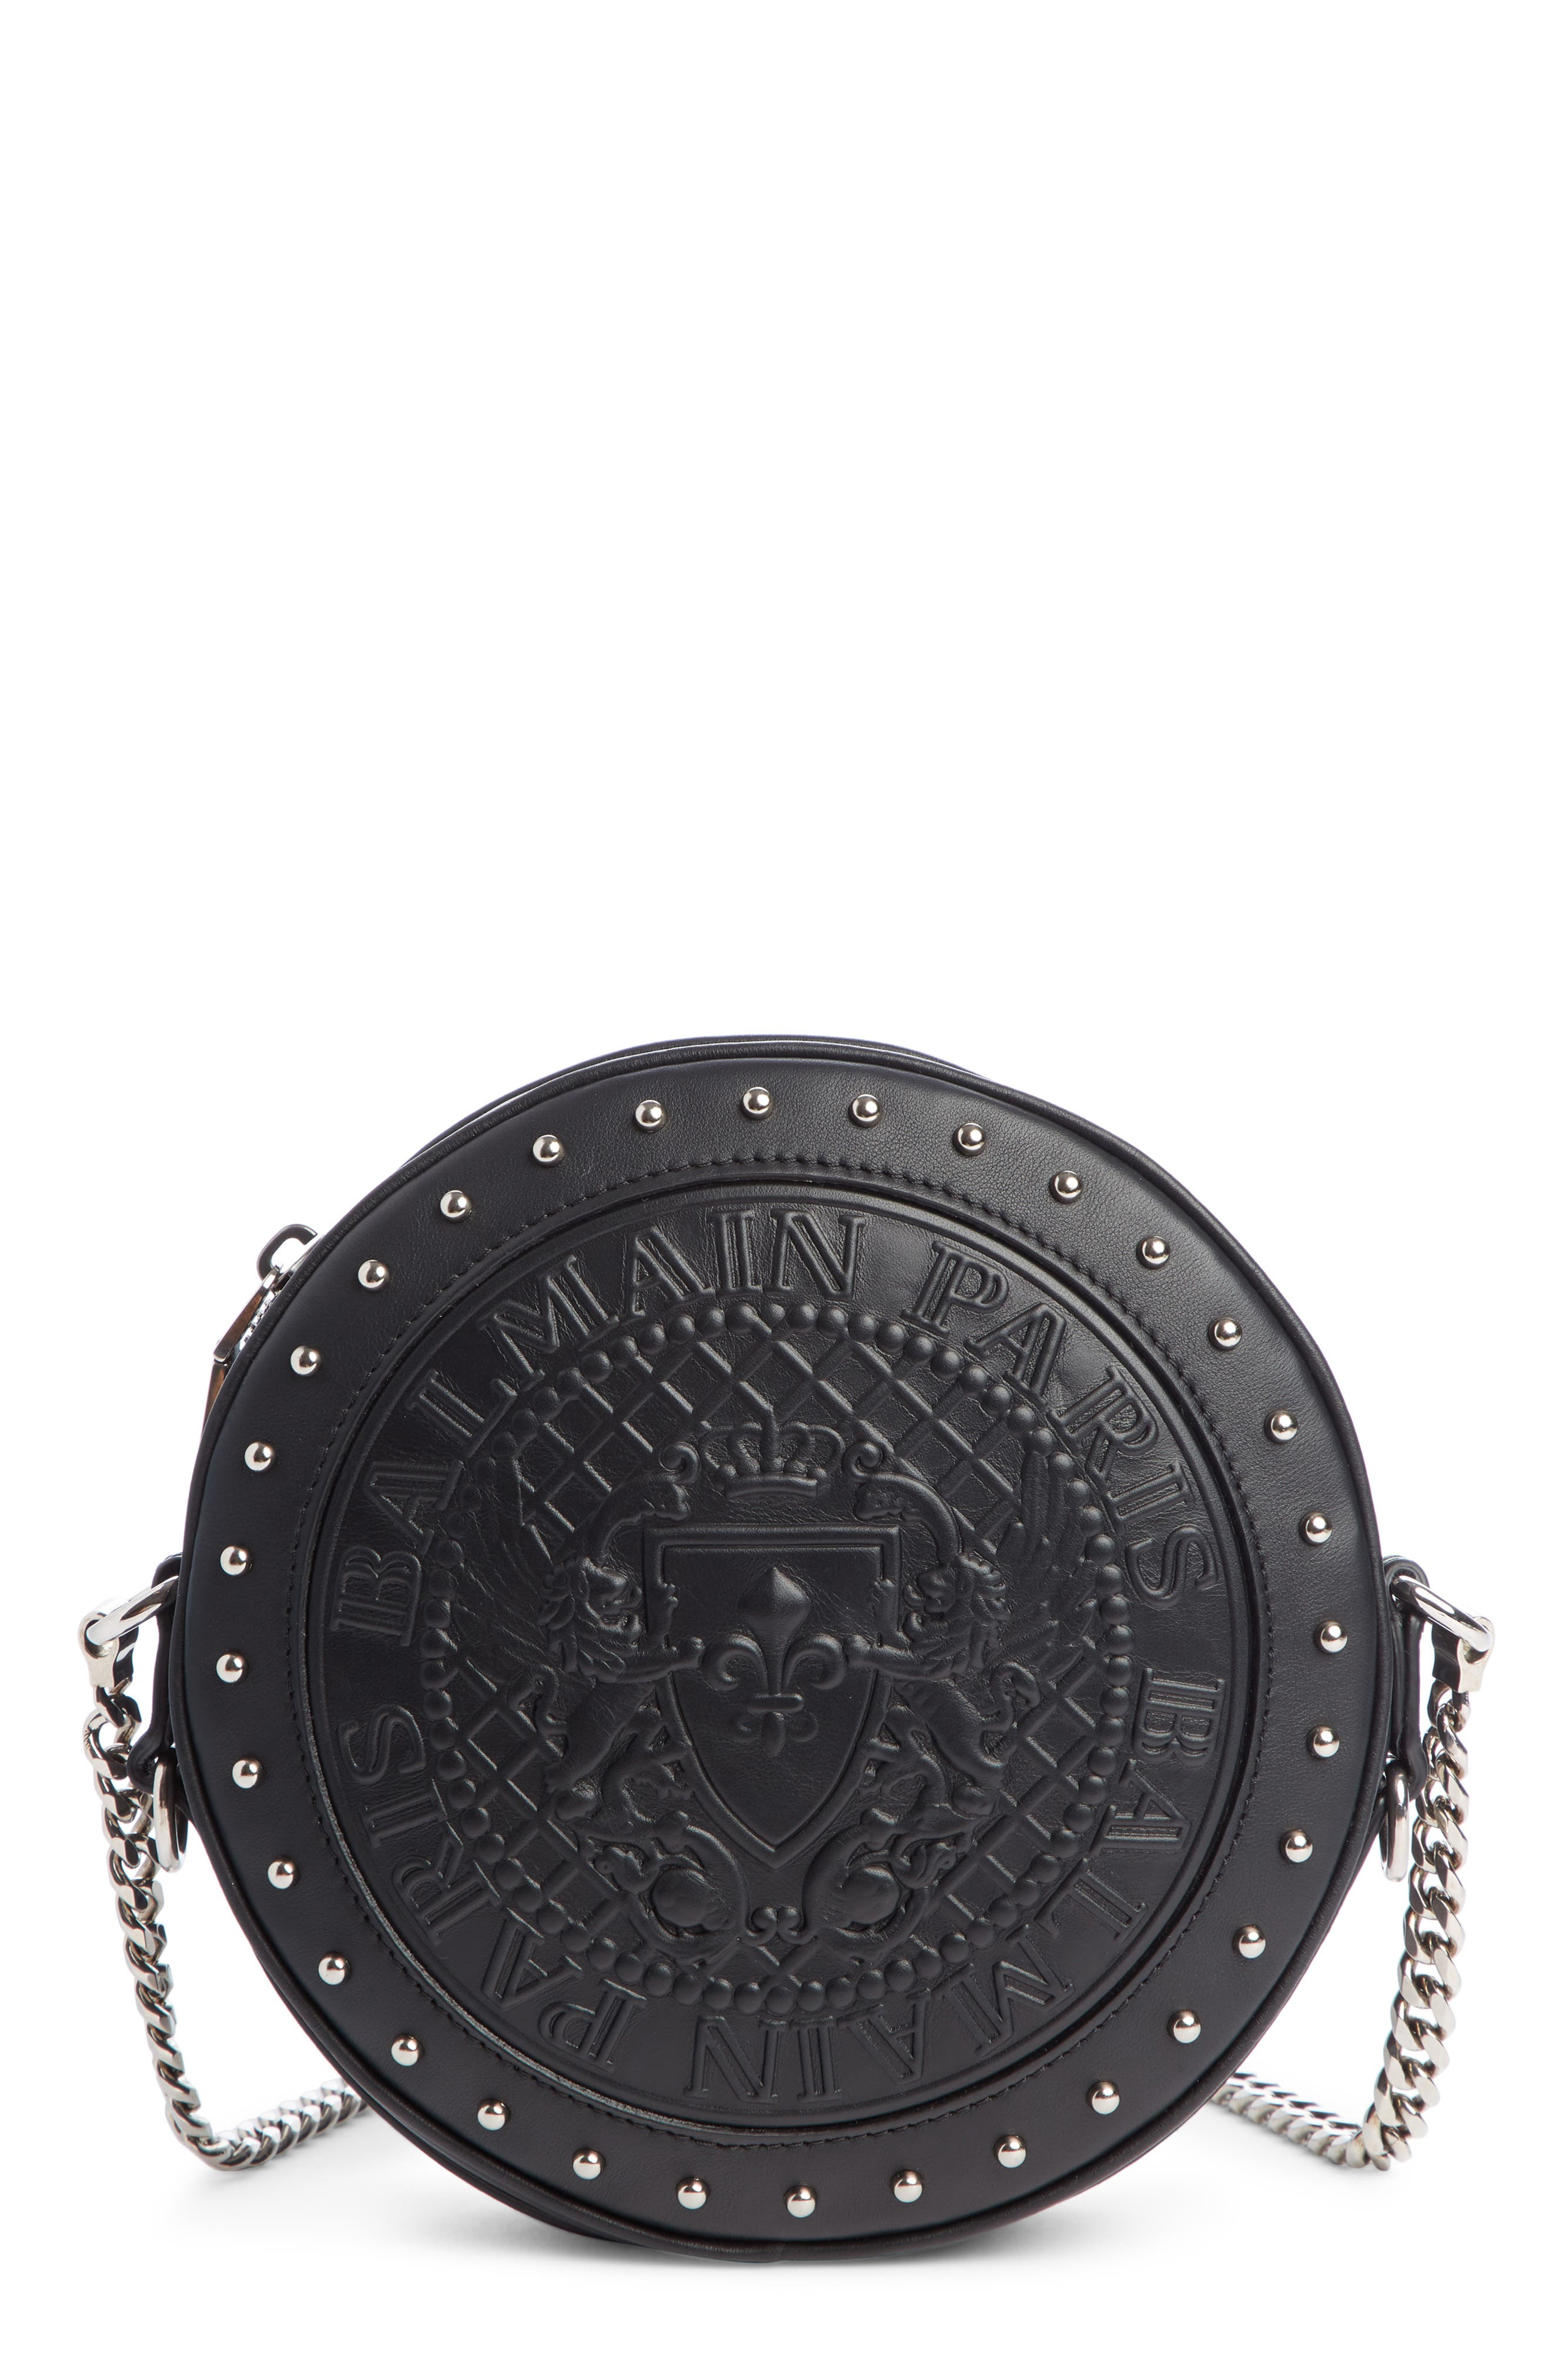 BALMAIN, Disco Embossed Calfskin Leather Crossbody Bag, Main thumbnail 1, color, NOIR